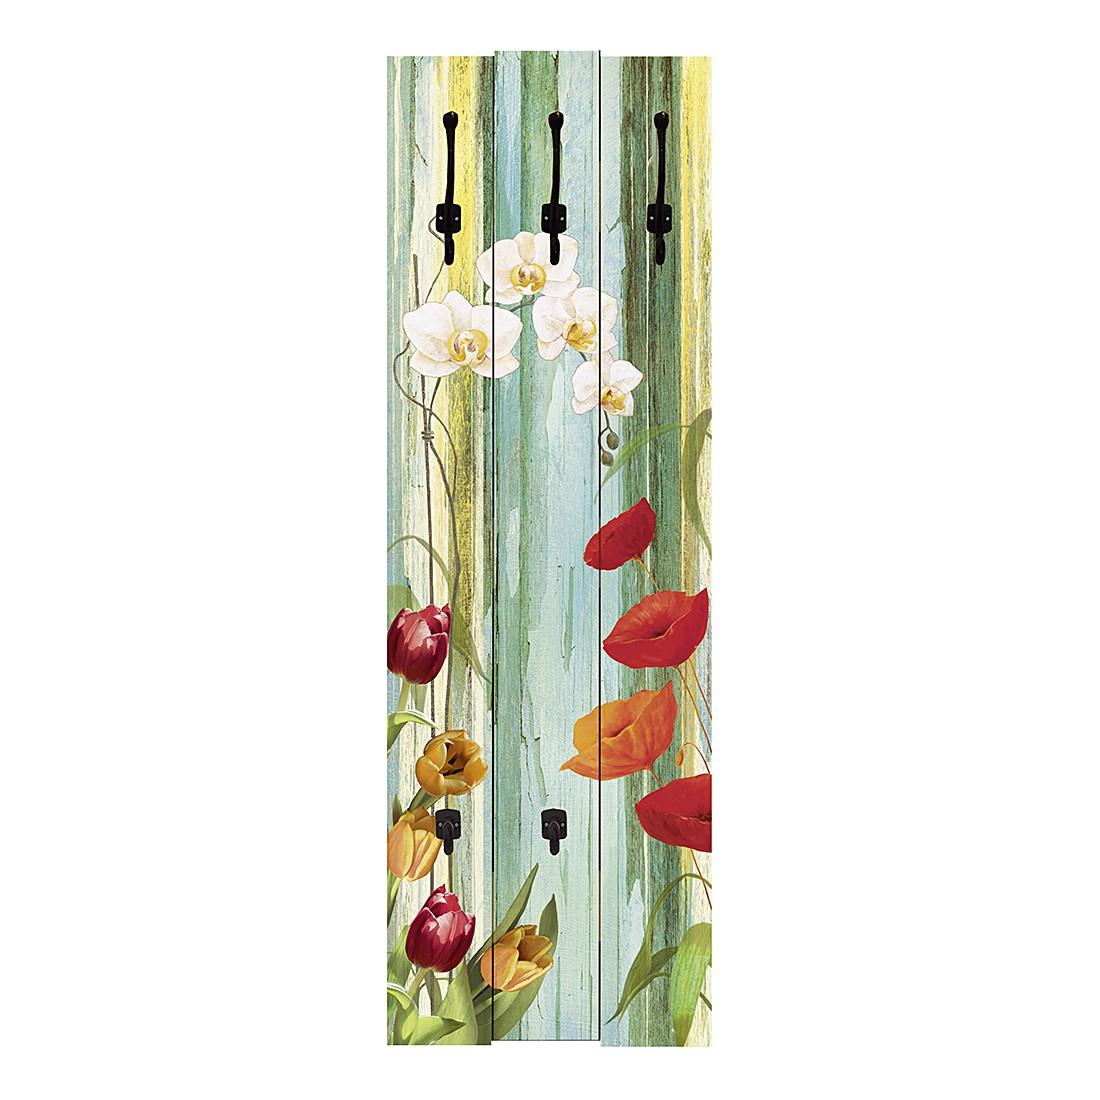 Garderobe Colorful Blossoms – Floral, Artland kaufen